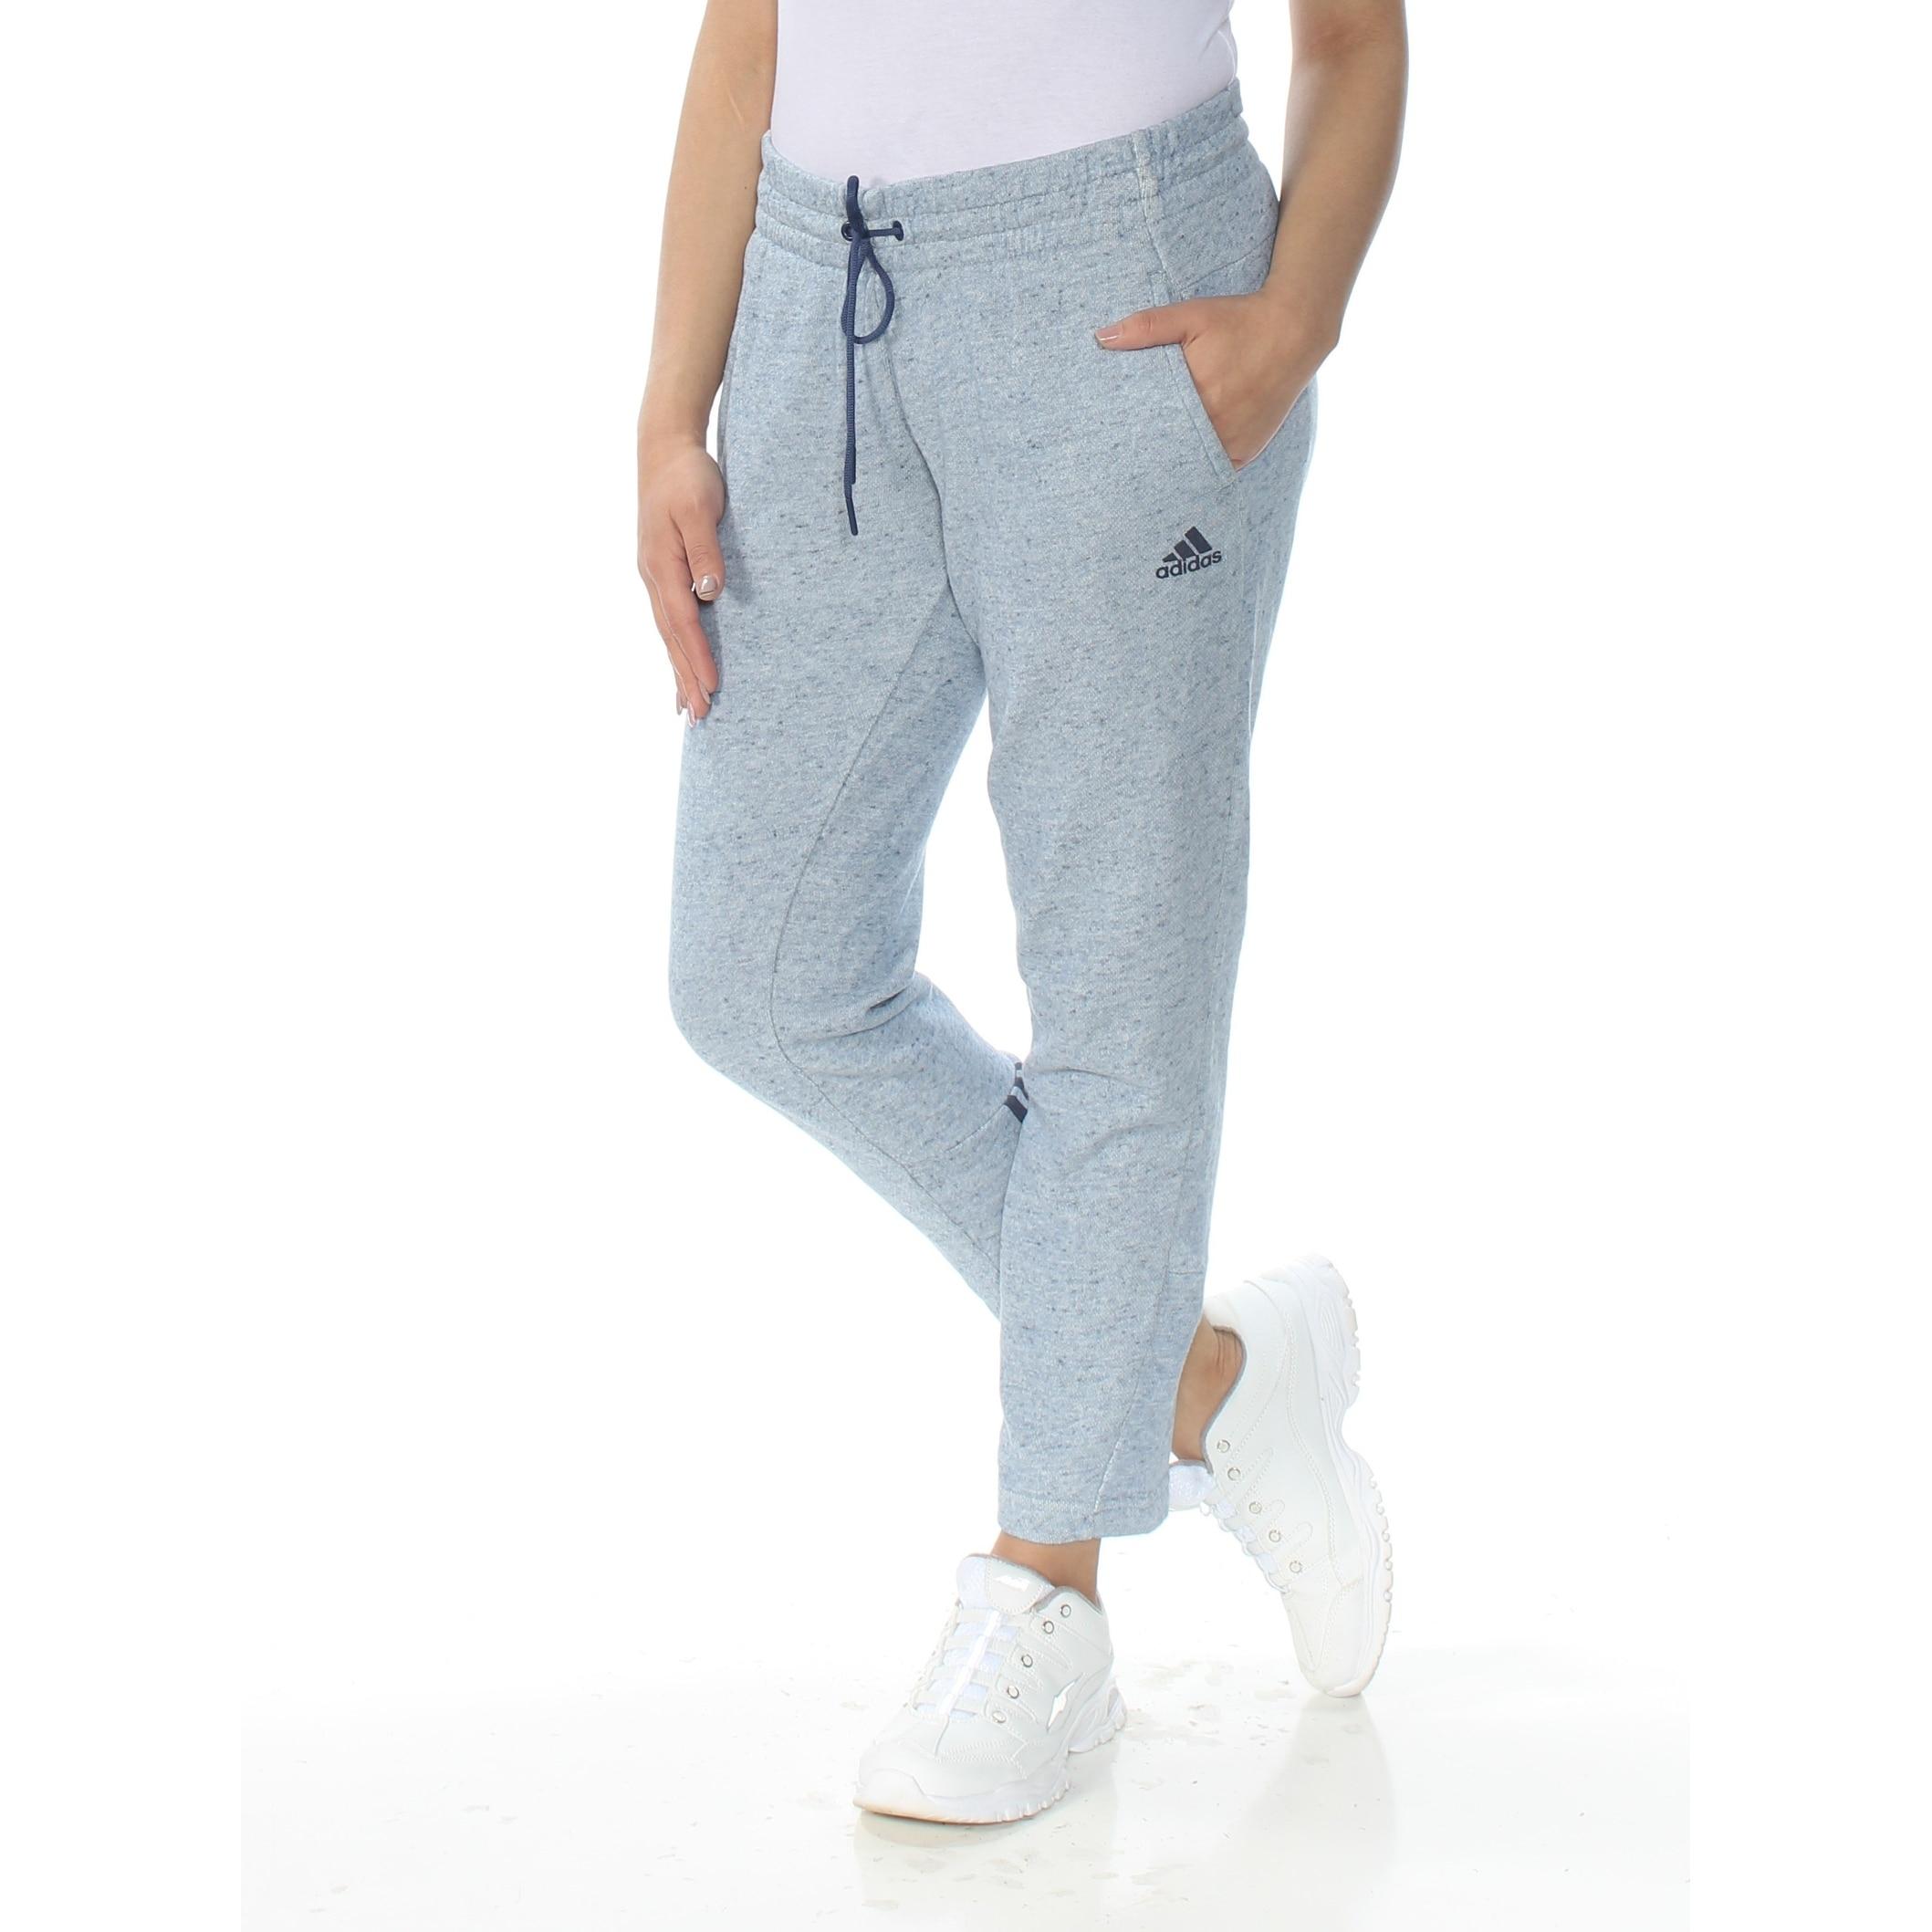 0ed34775da7b Adidas Pants